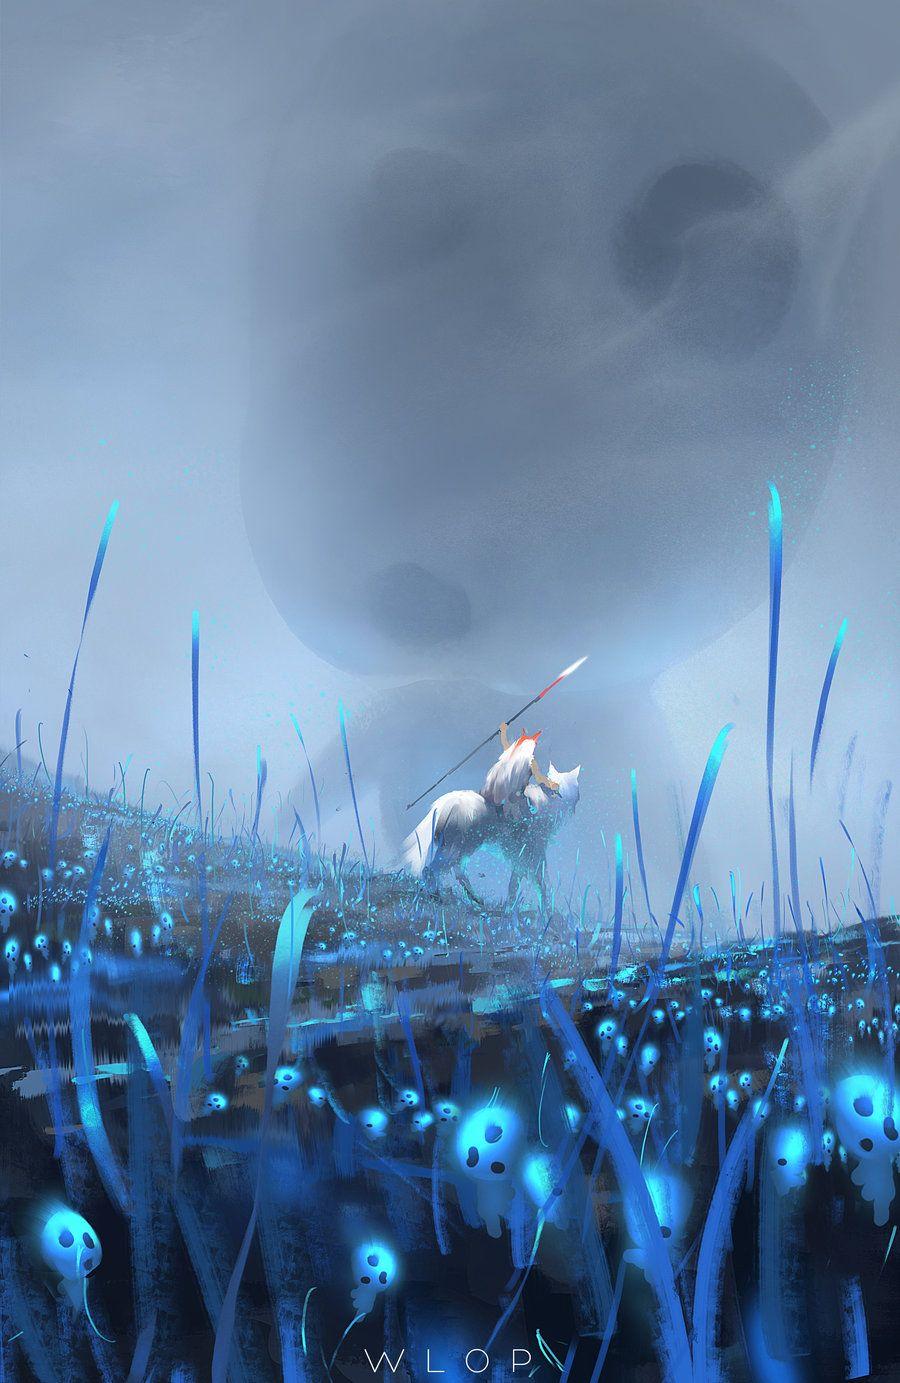 Princess Mononoke By Wlopdeviantartcom On At Deviantart Art By